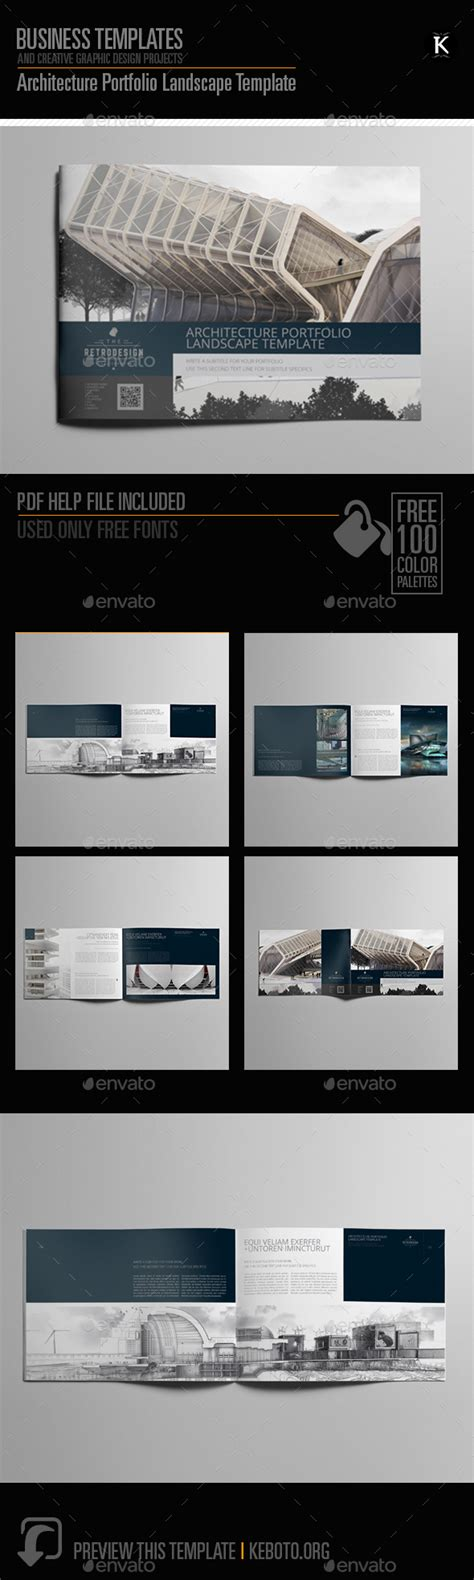 Architecture Portfolio Landscape Template By Keboto